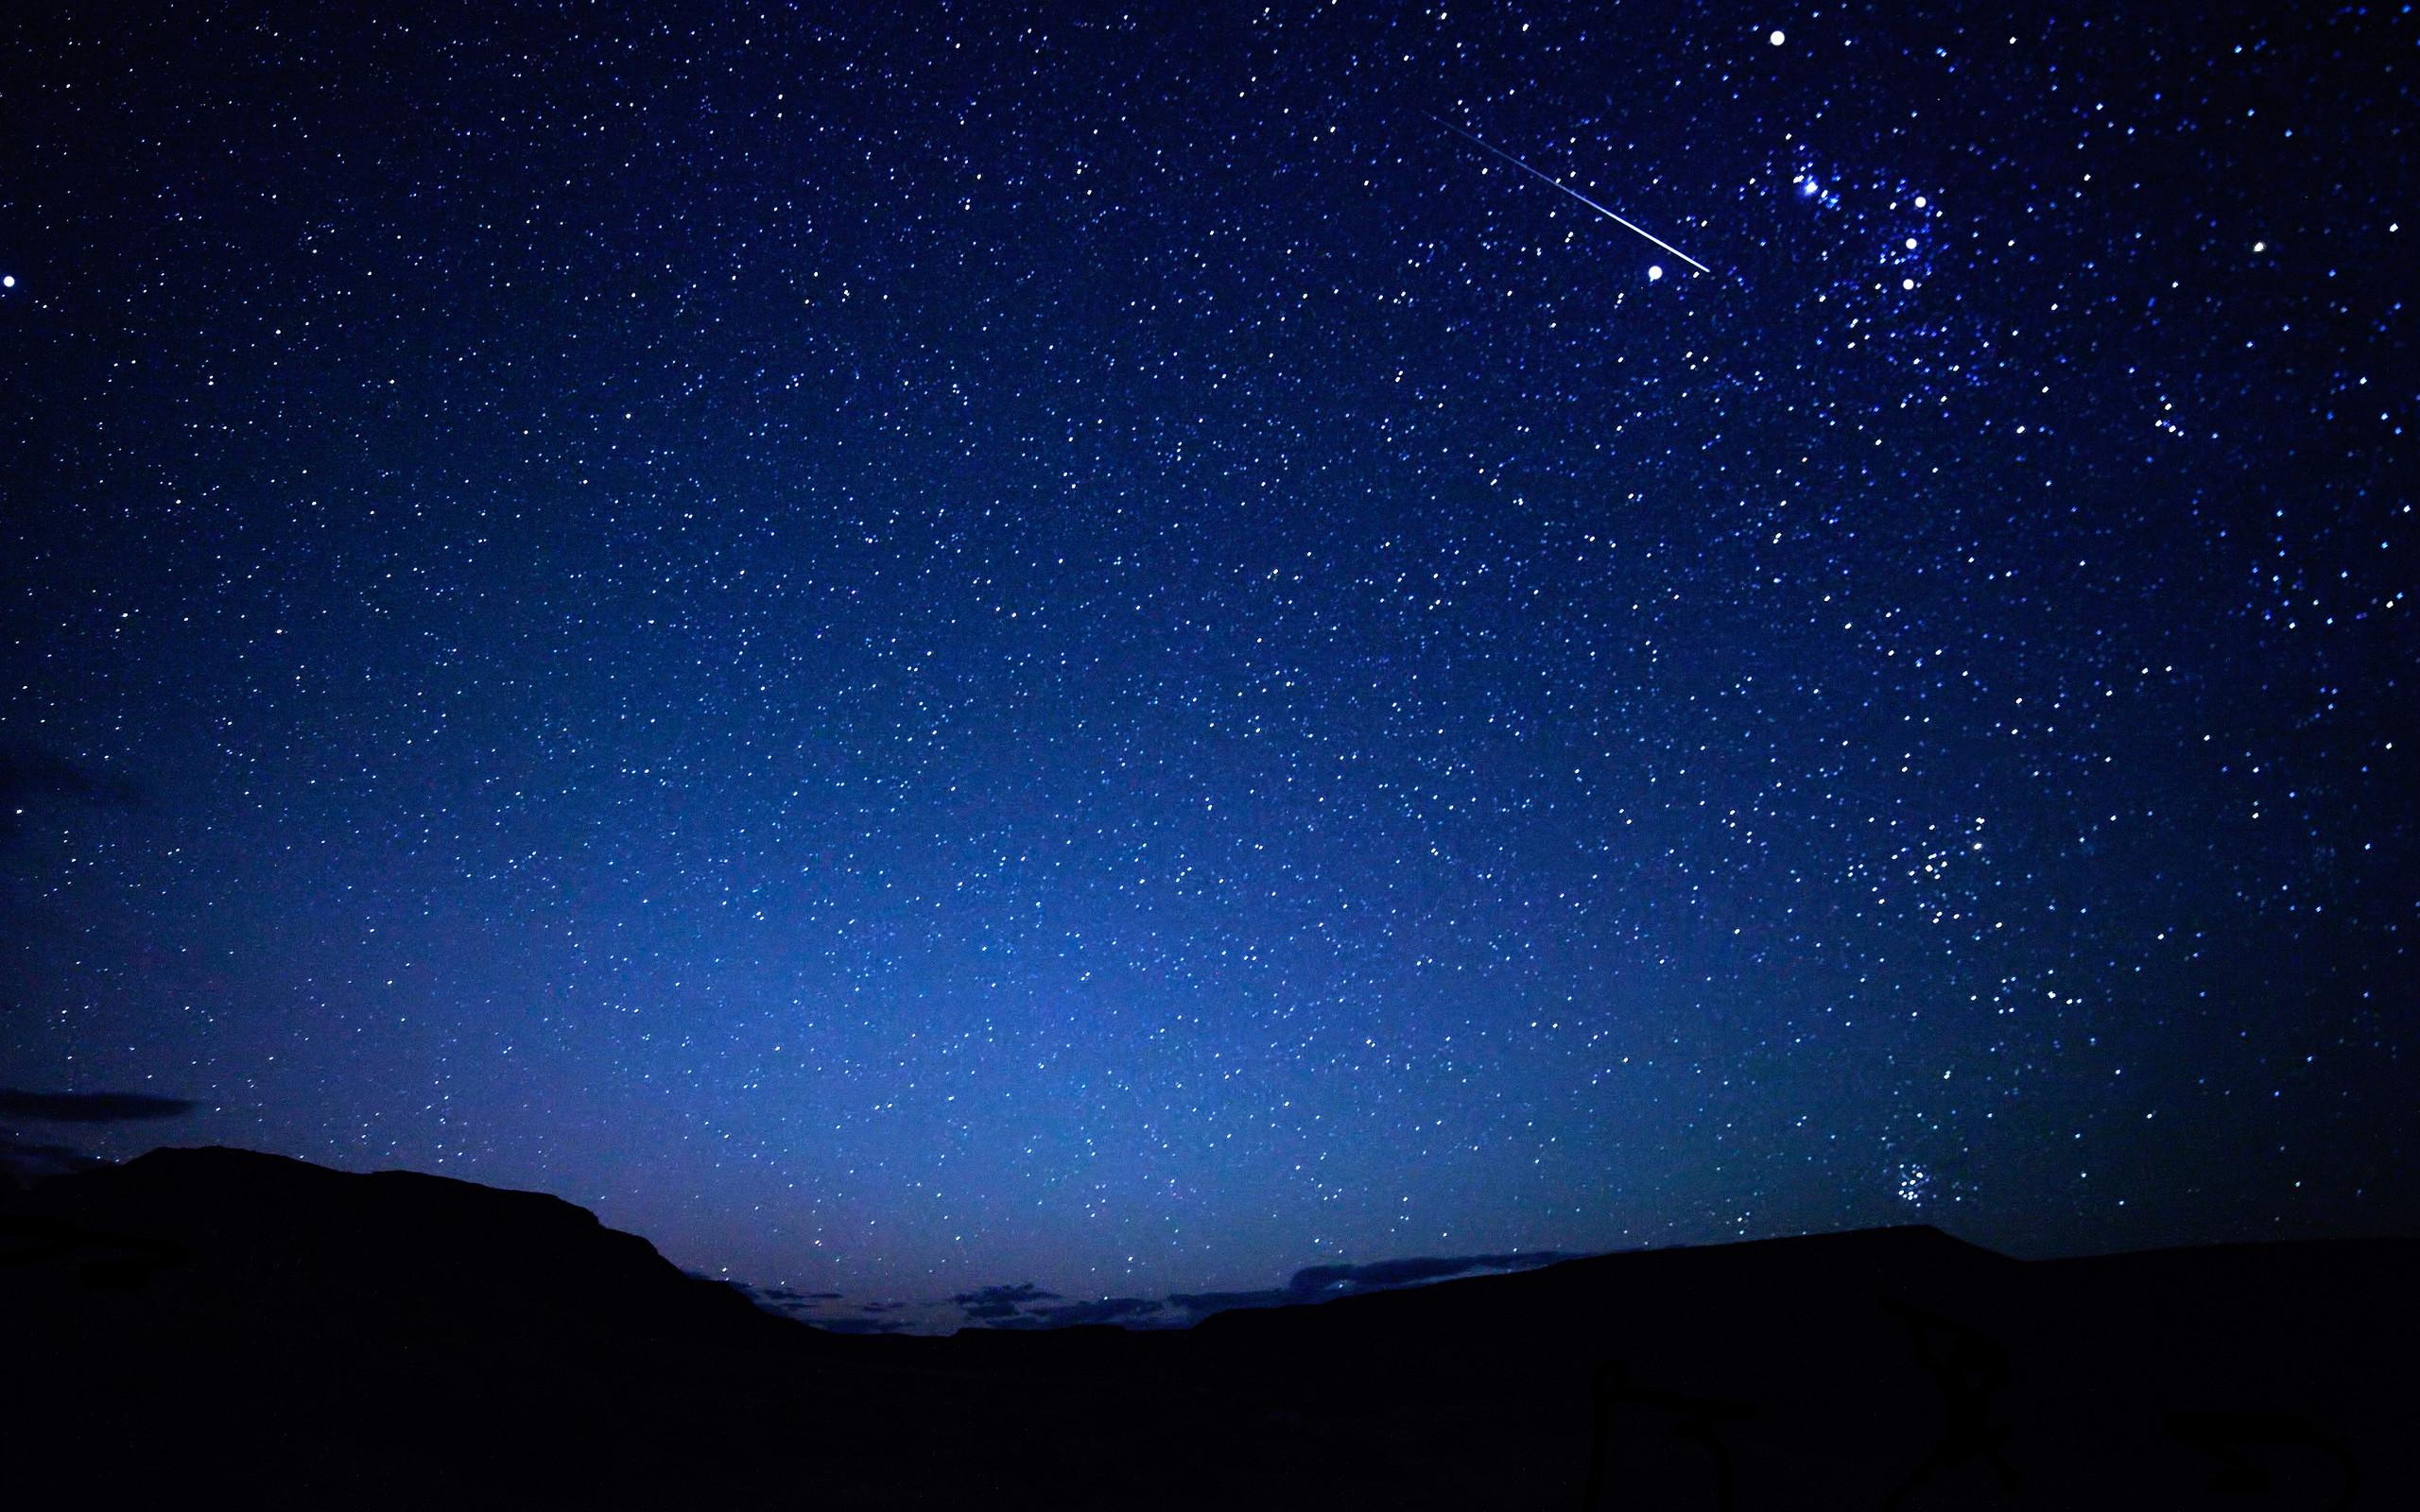 wallpaper-stars-nightnight-sky-hd-wallpapers-nature-night-sky-wallpapers -for-rufb6m96